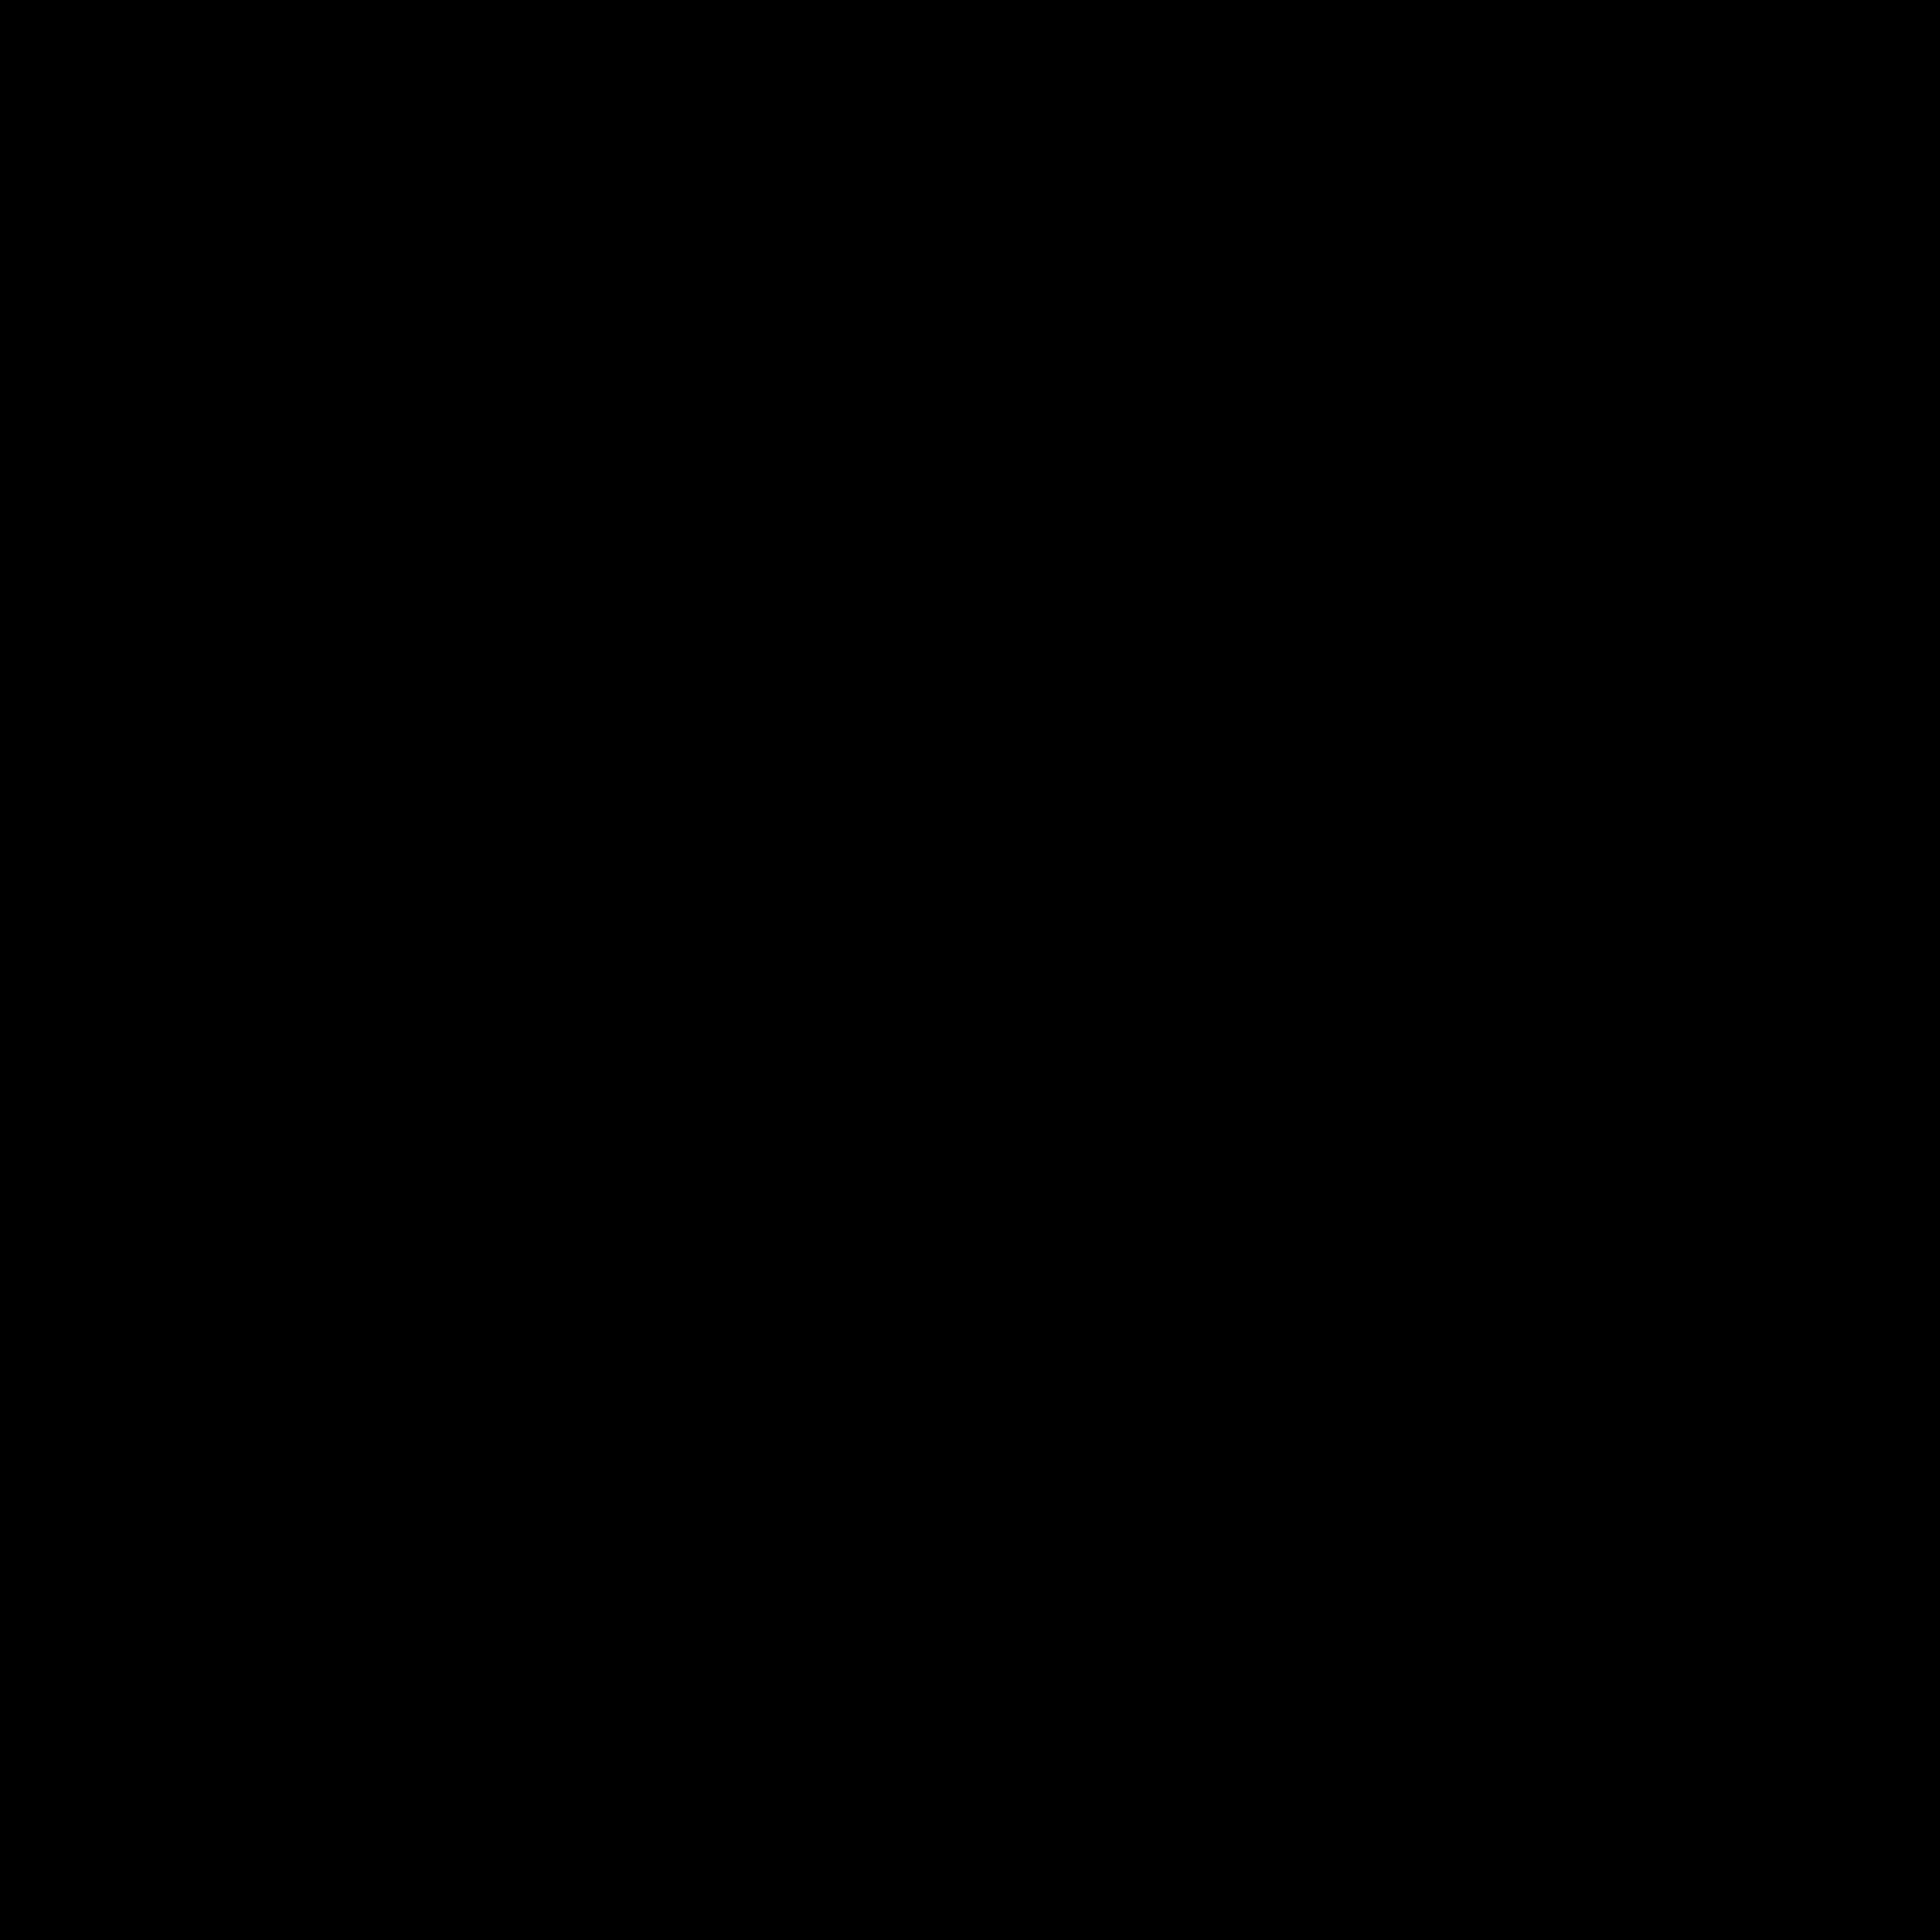 Single black arrow clipart jpg freeuse stock Arrow Simple Black Top transparent PNG - StickPNG jpg freeuse stock